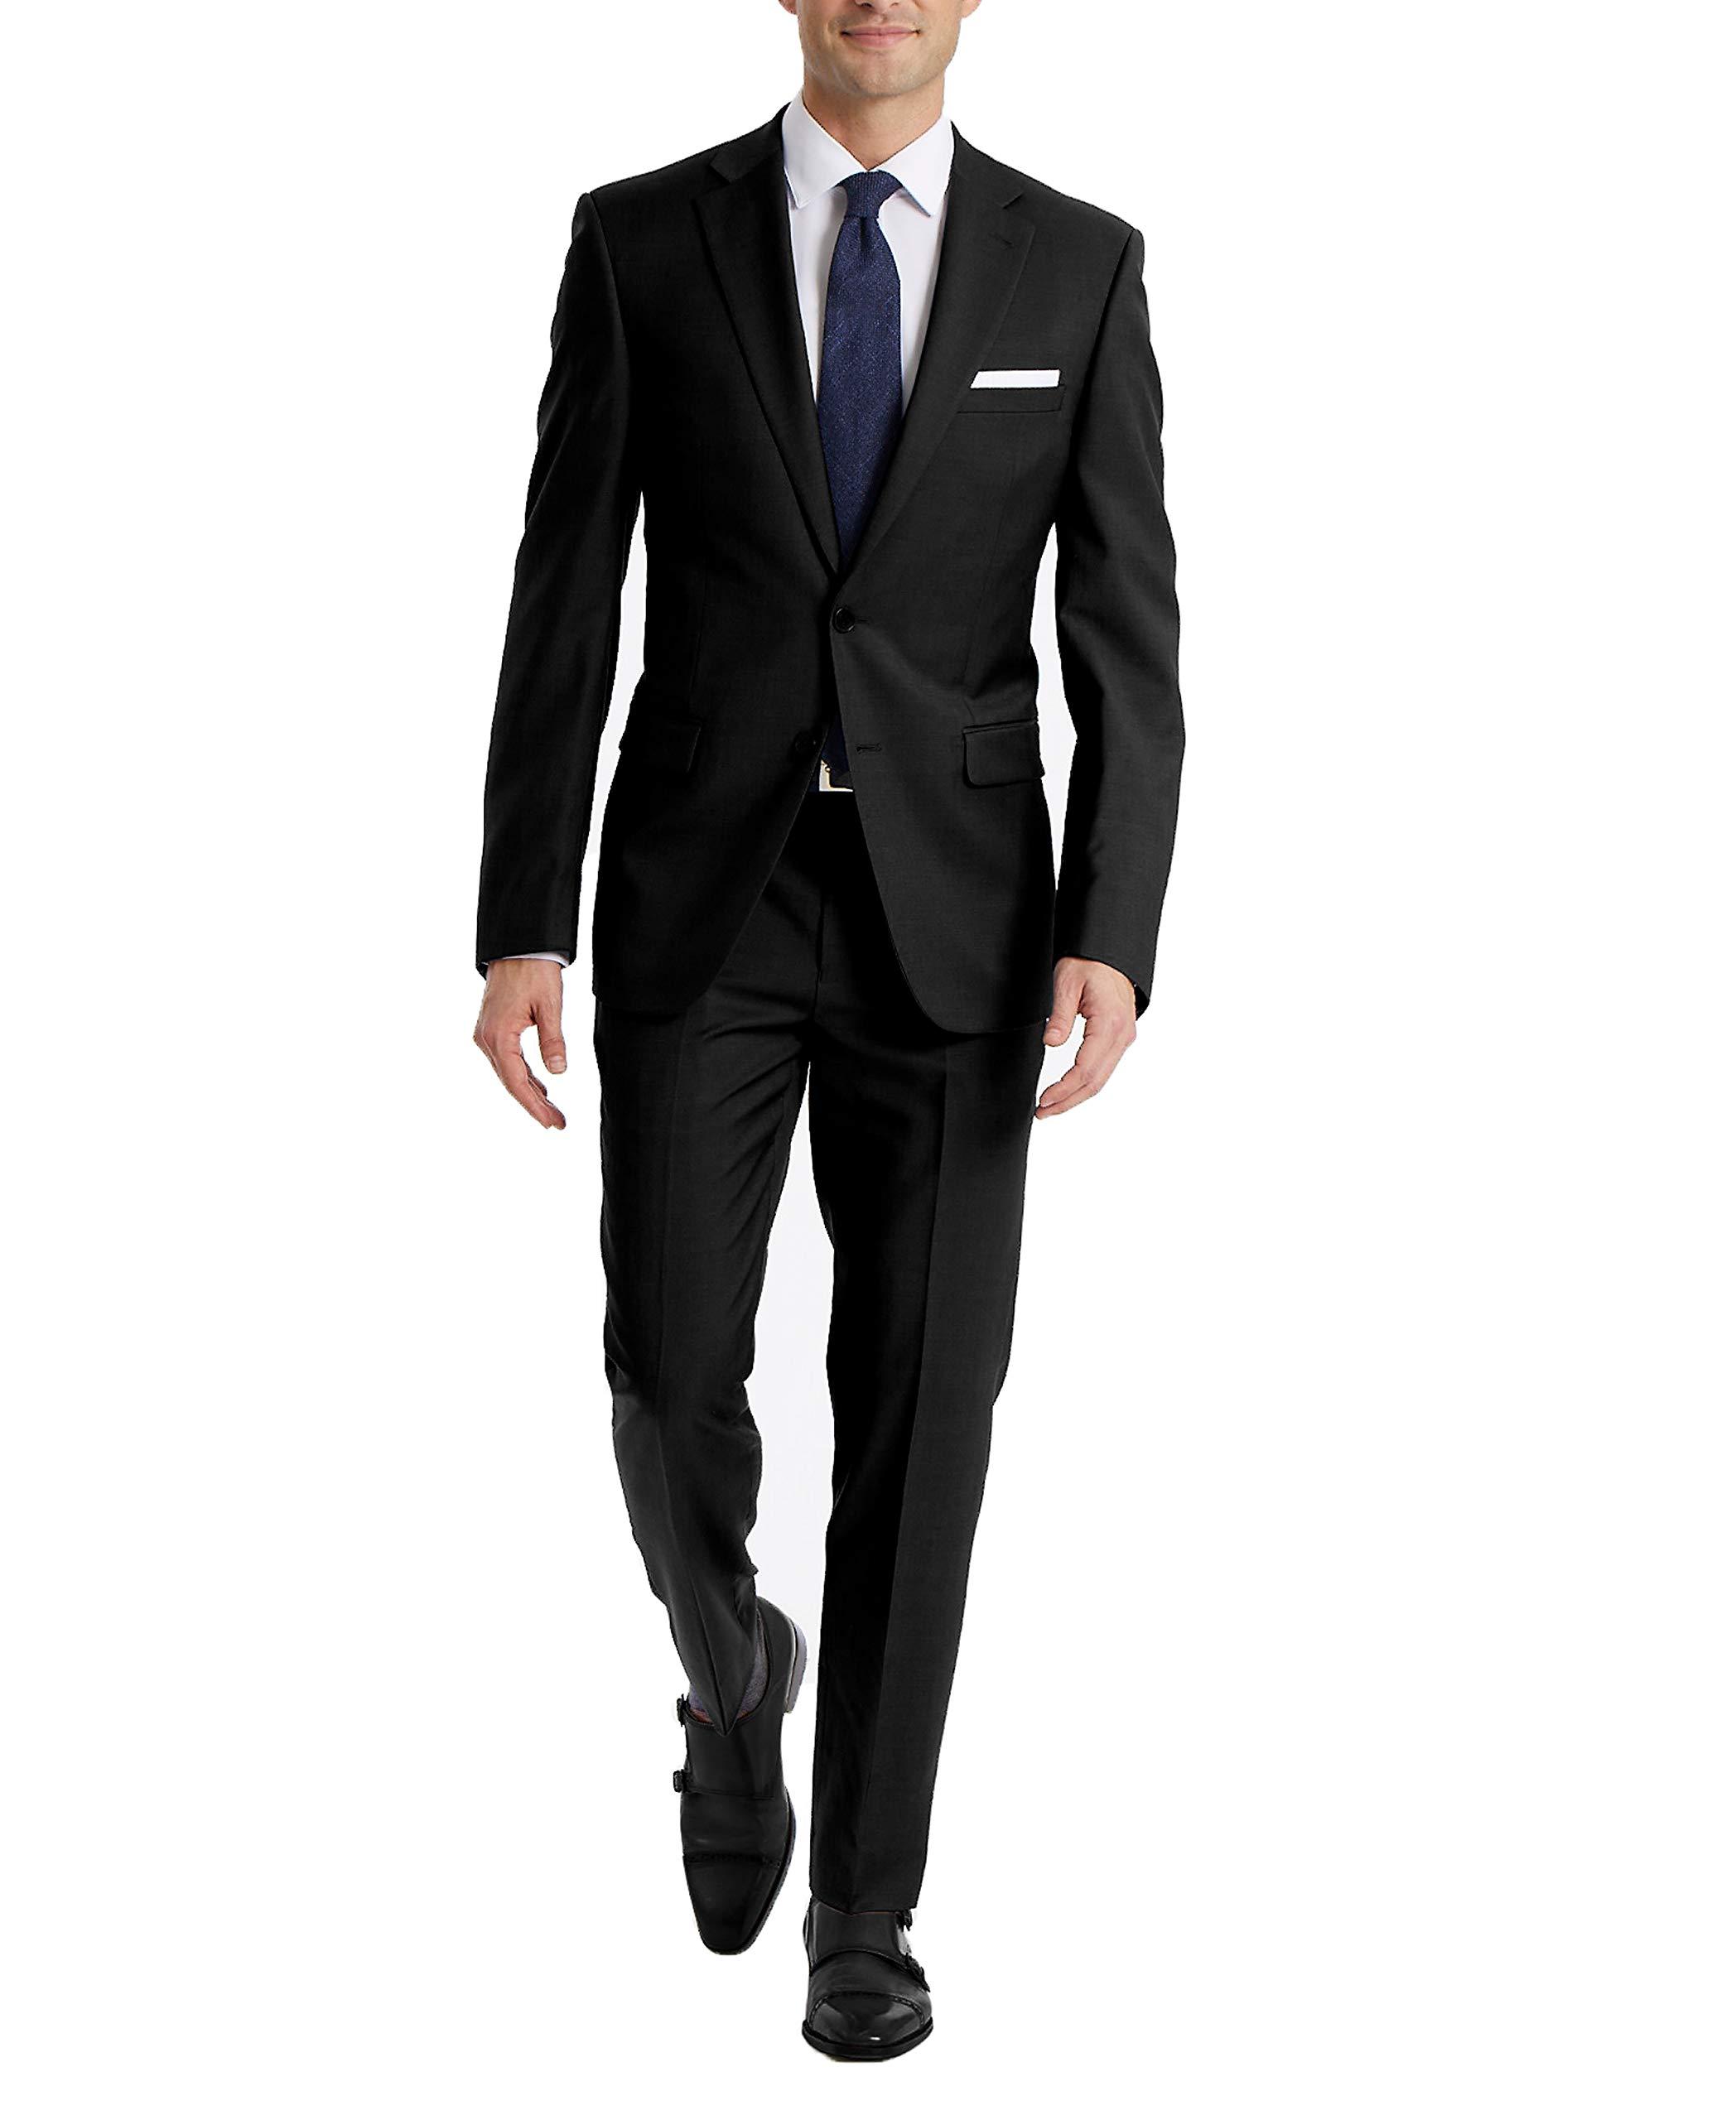 Blazer, Pant, and Vest Perry Ellis Mens Modern Fit Suit Separate